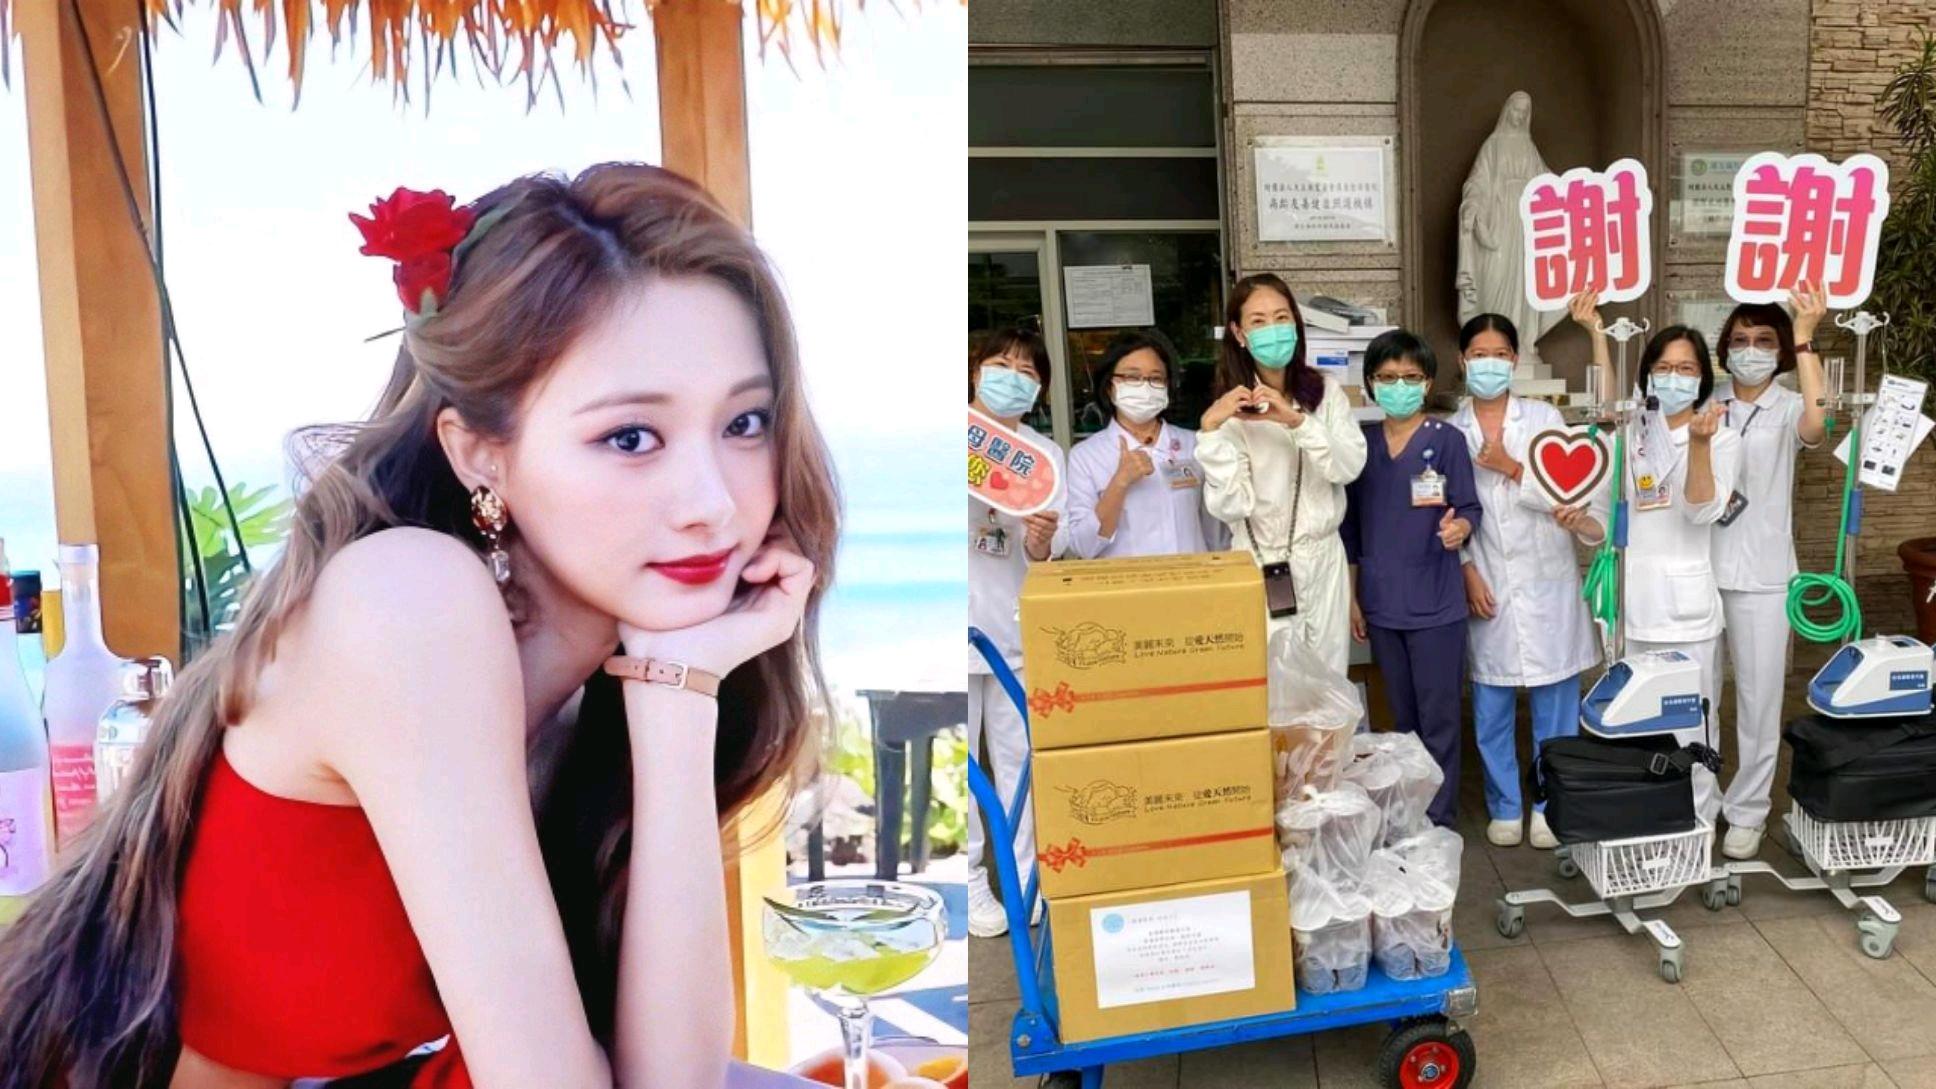 TWICE周子瑜为中国台湾疫情捐50台PAPR,比林依晨小S陶晶莹都多